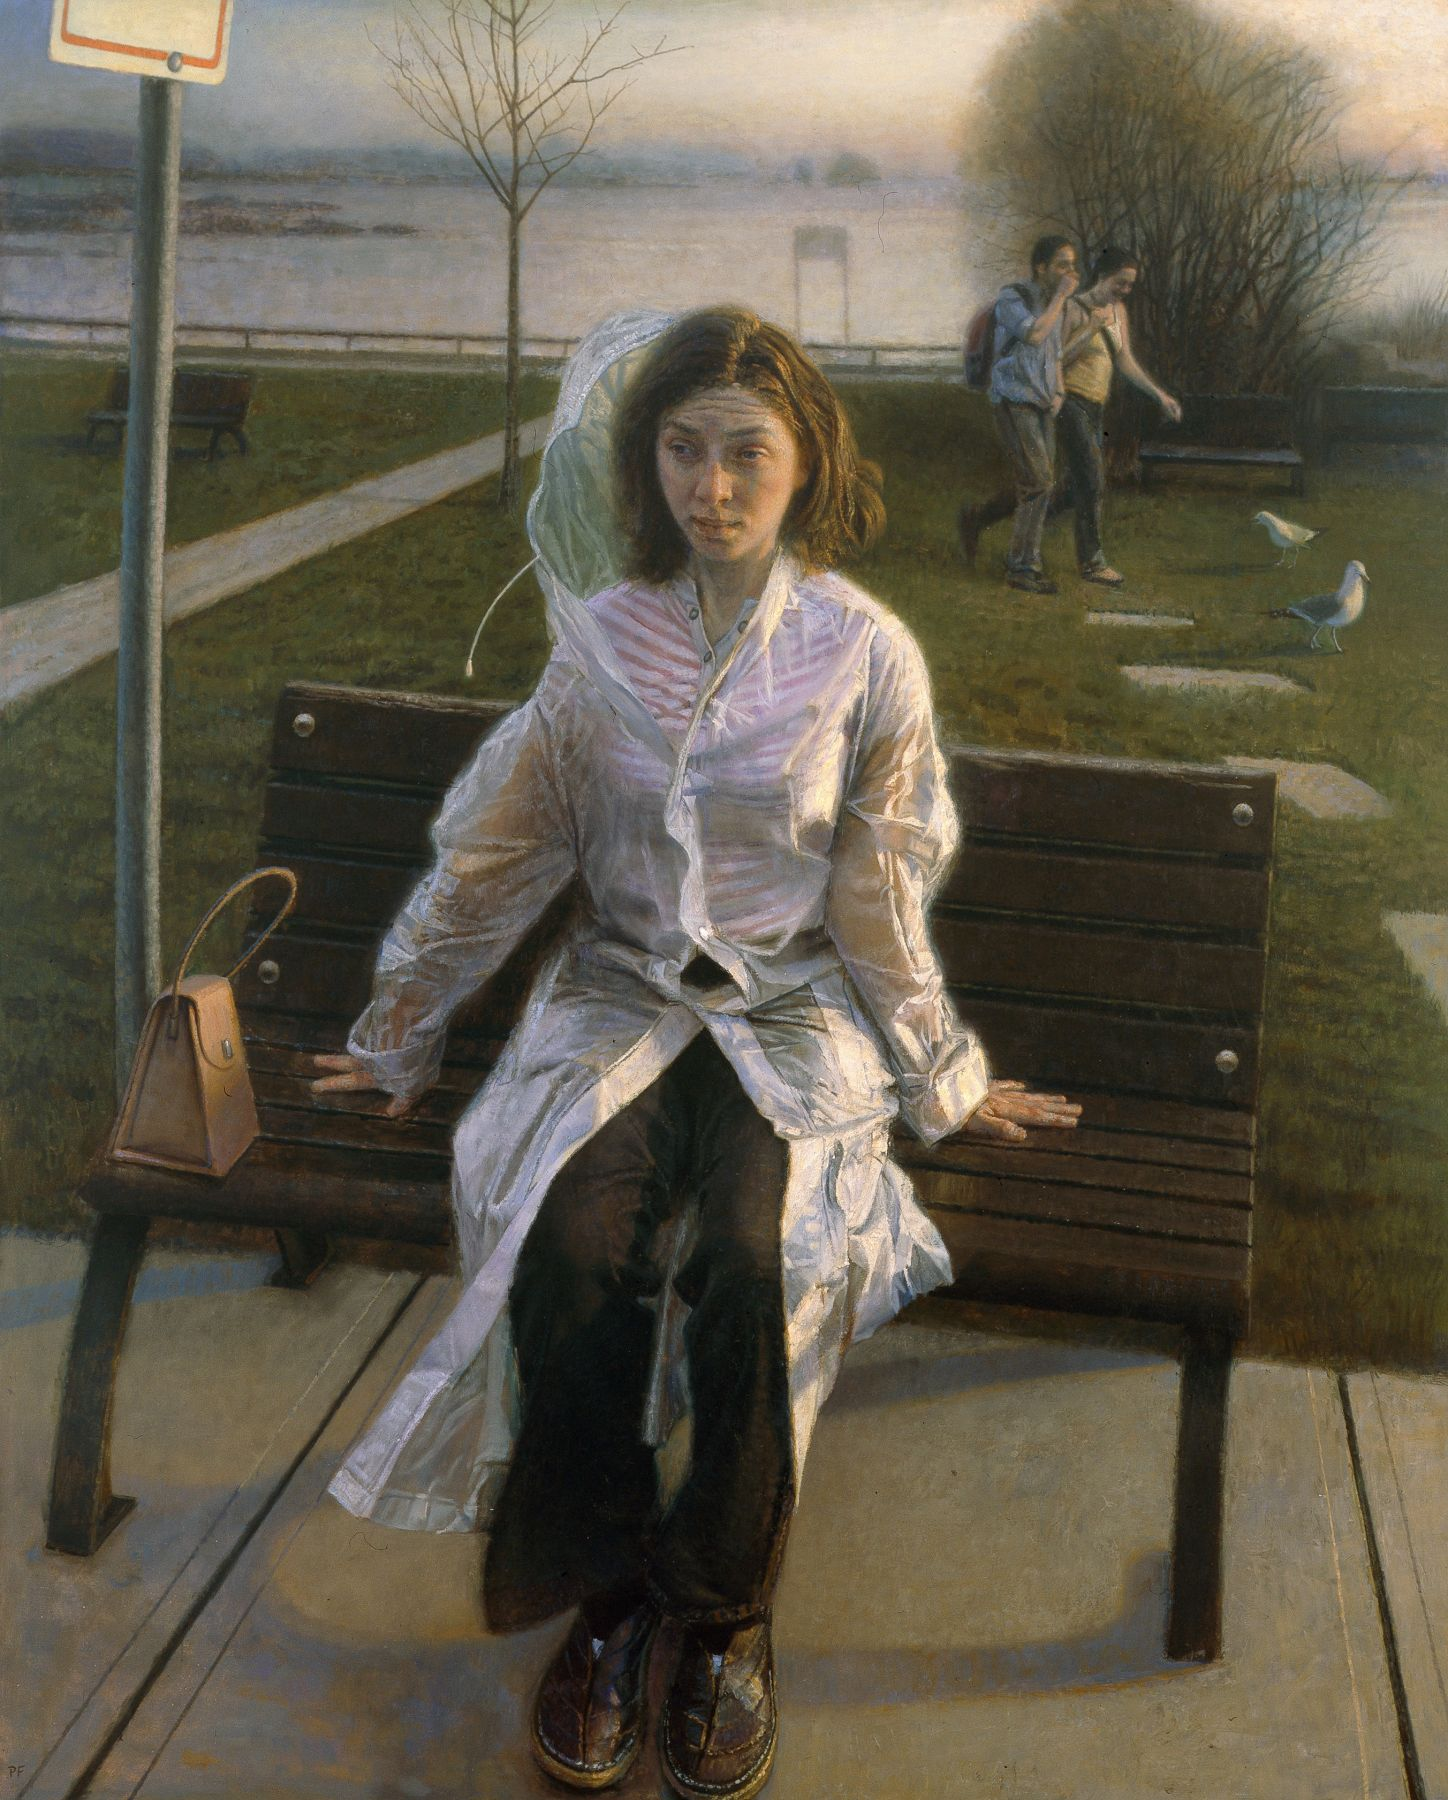 Paul Fenniak, Bus Stop (SOLD), 2007, oil on canvas, 60 x 48 inches